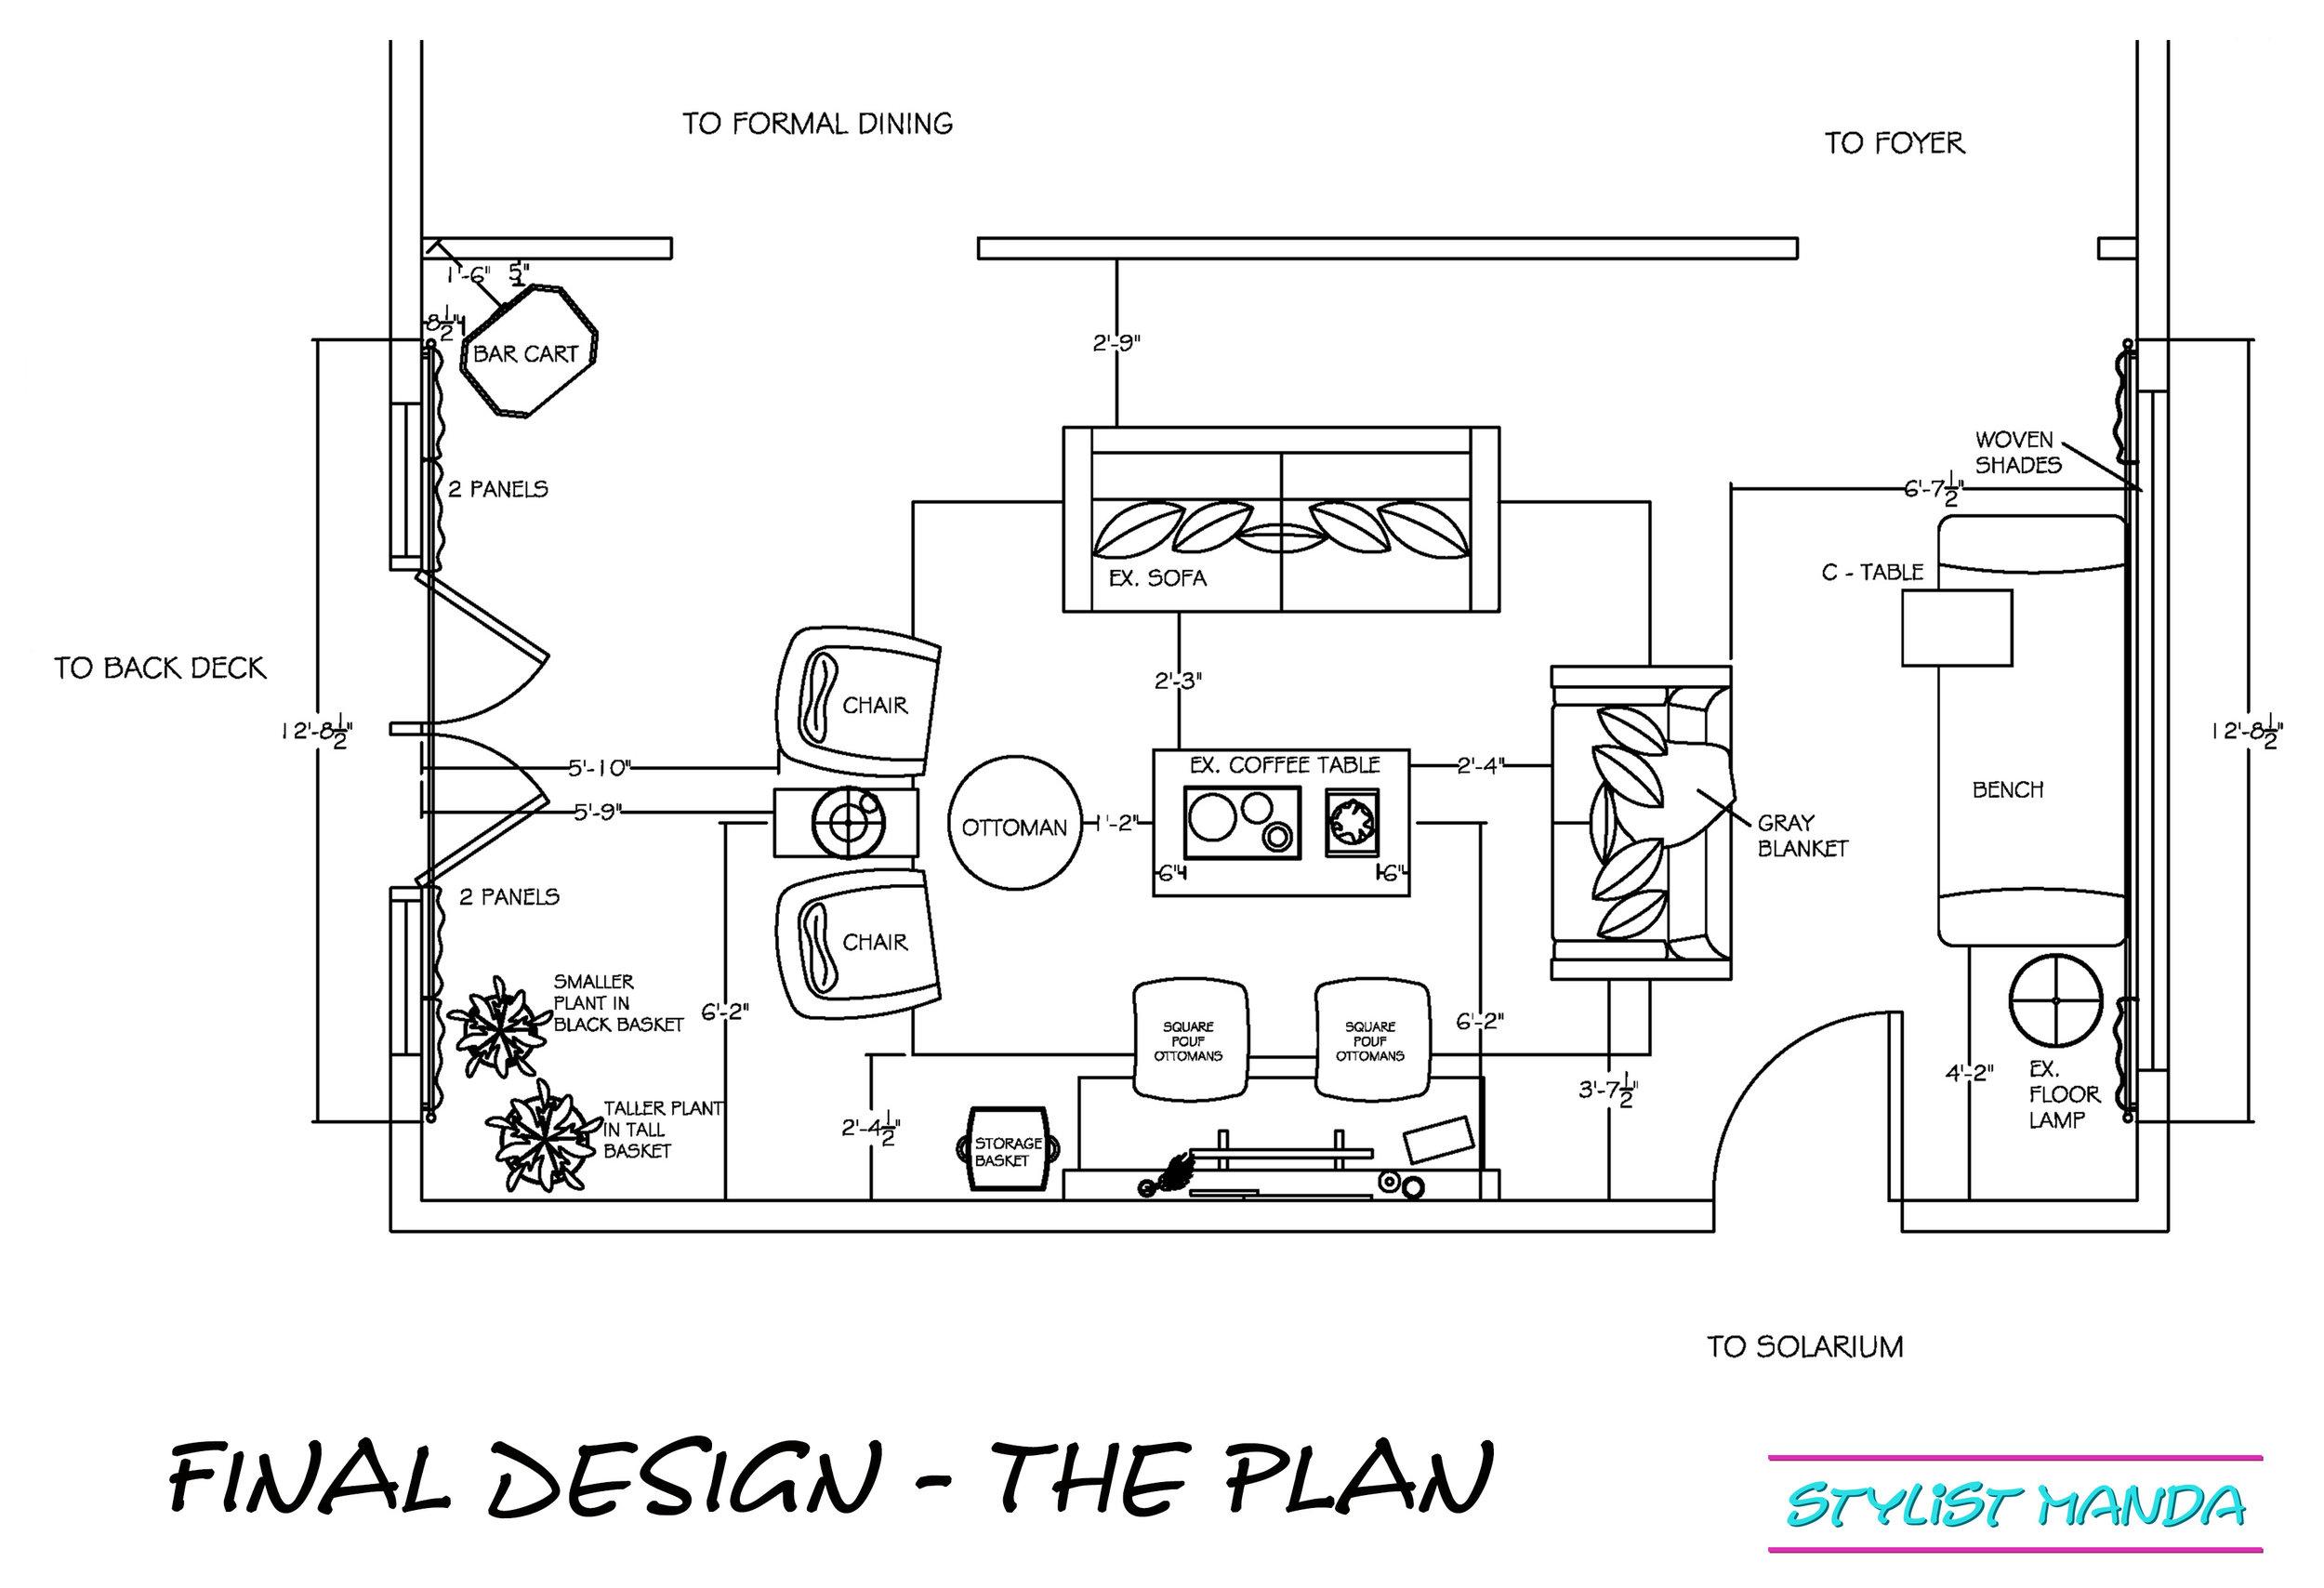 final design the plan example